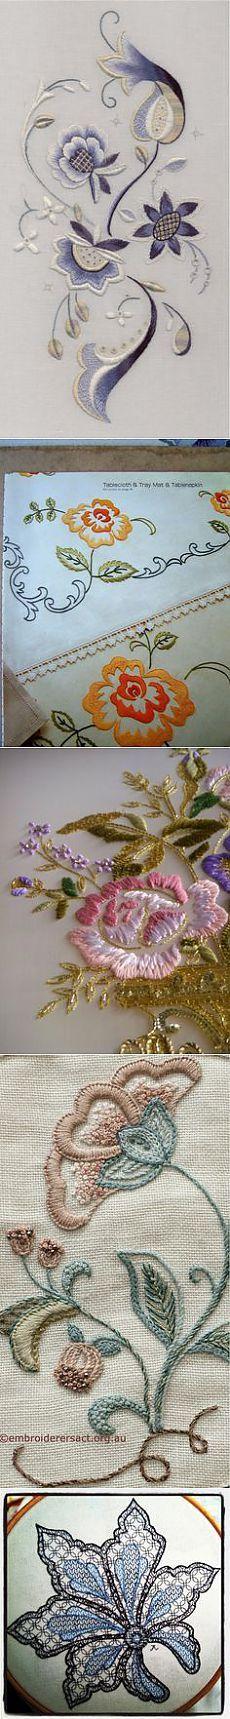 Bordados - Blackwork - Embroidery - Diy - Do It Yourself